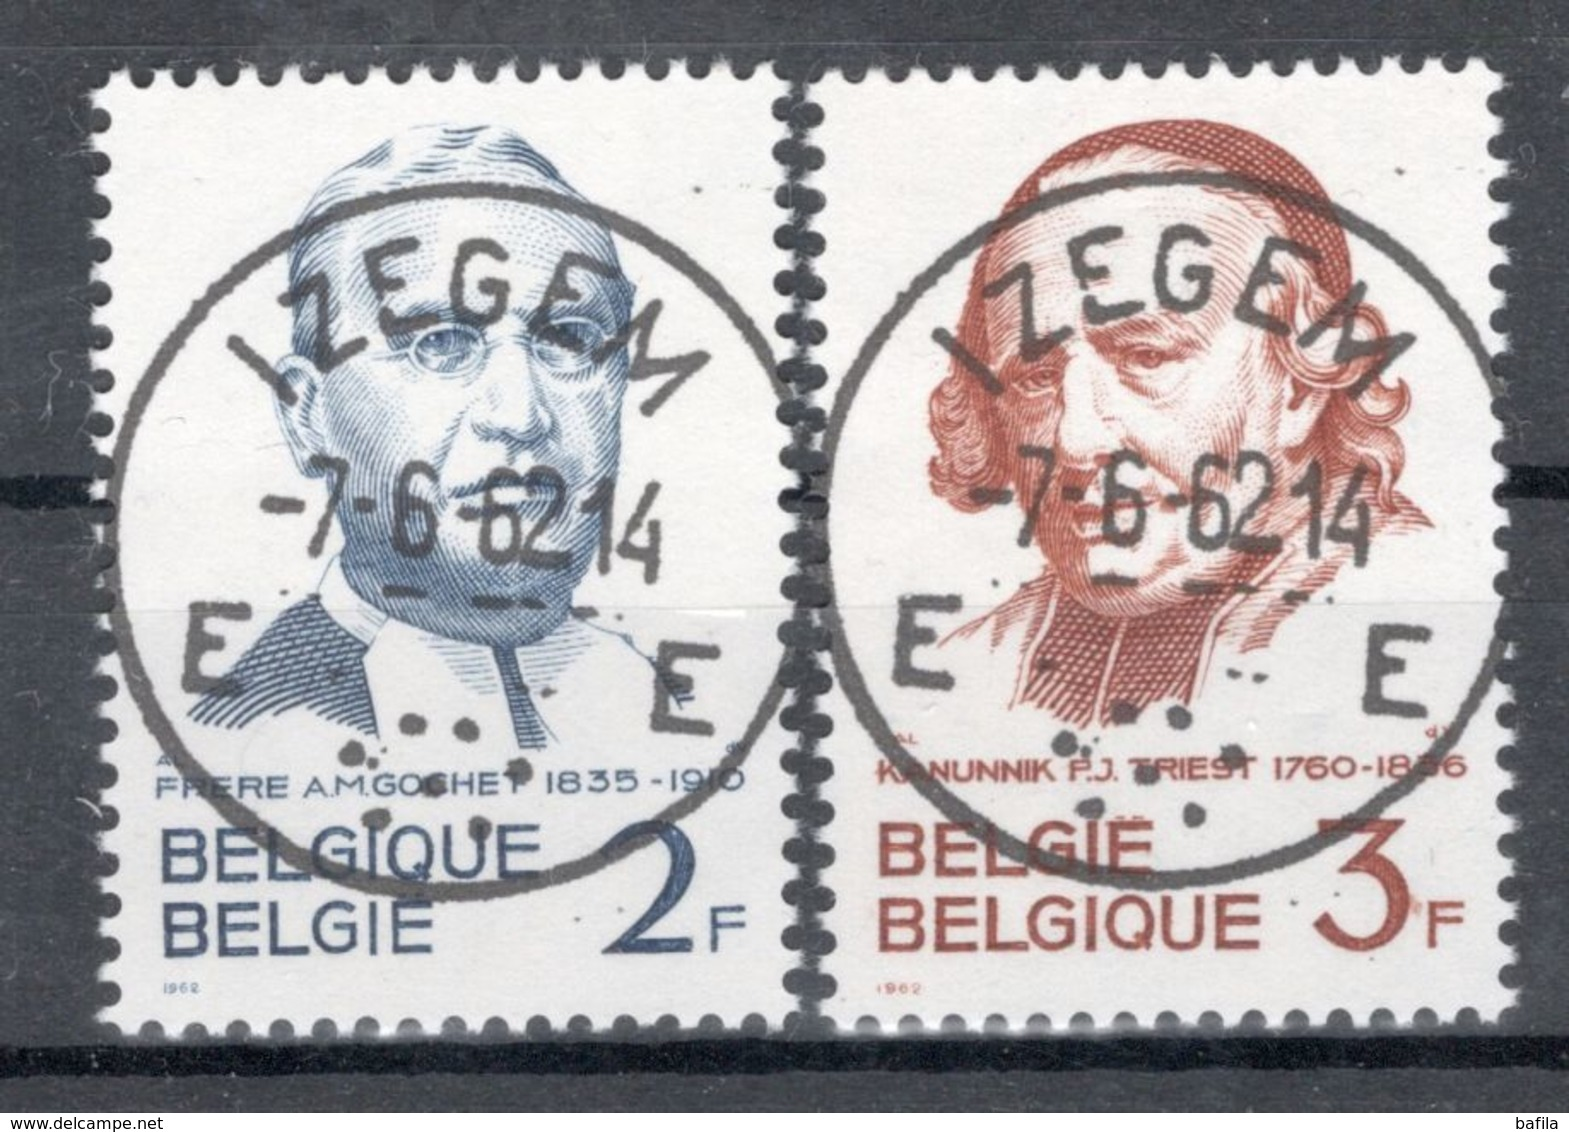 BELGIE: COB 1214/1215 Zeer Mooi Gestempeld. - Belgium